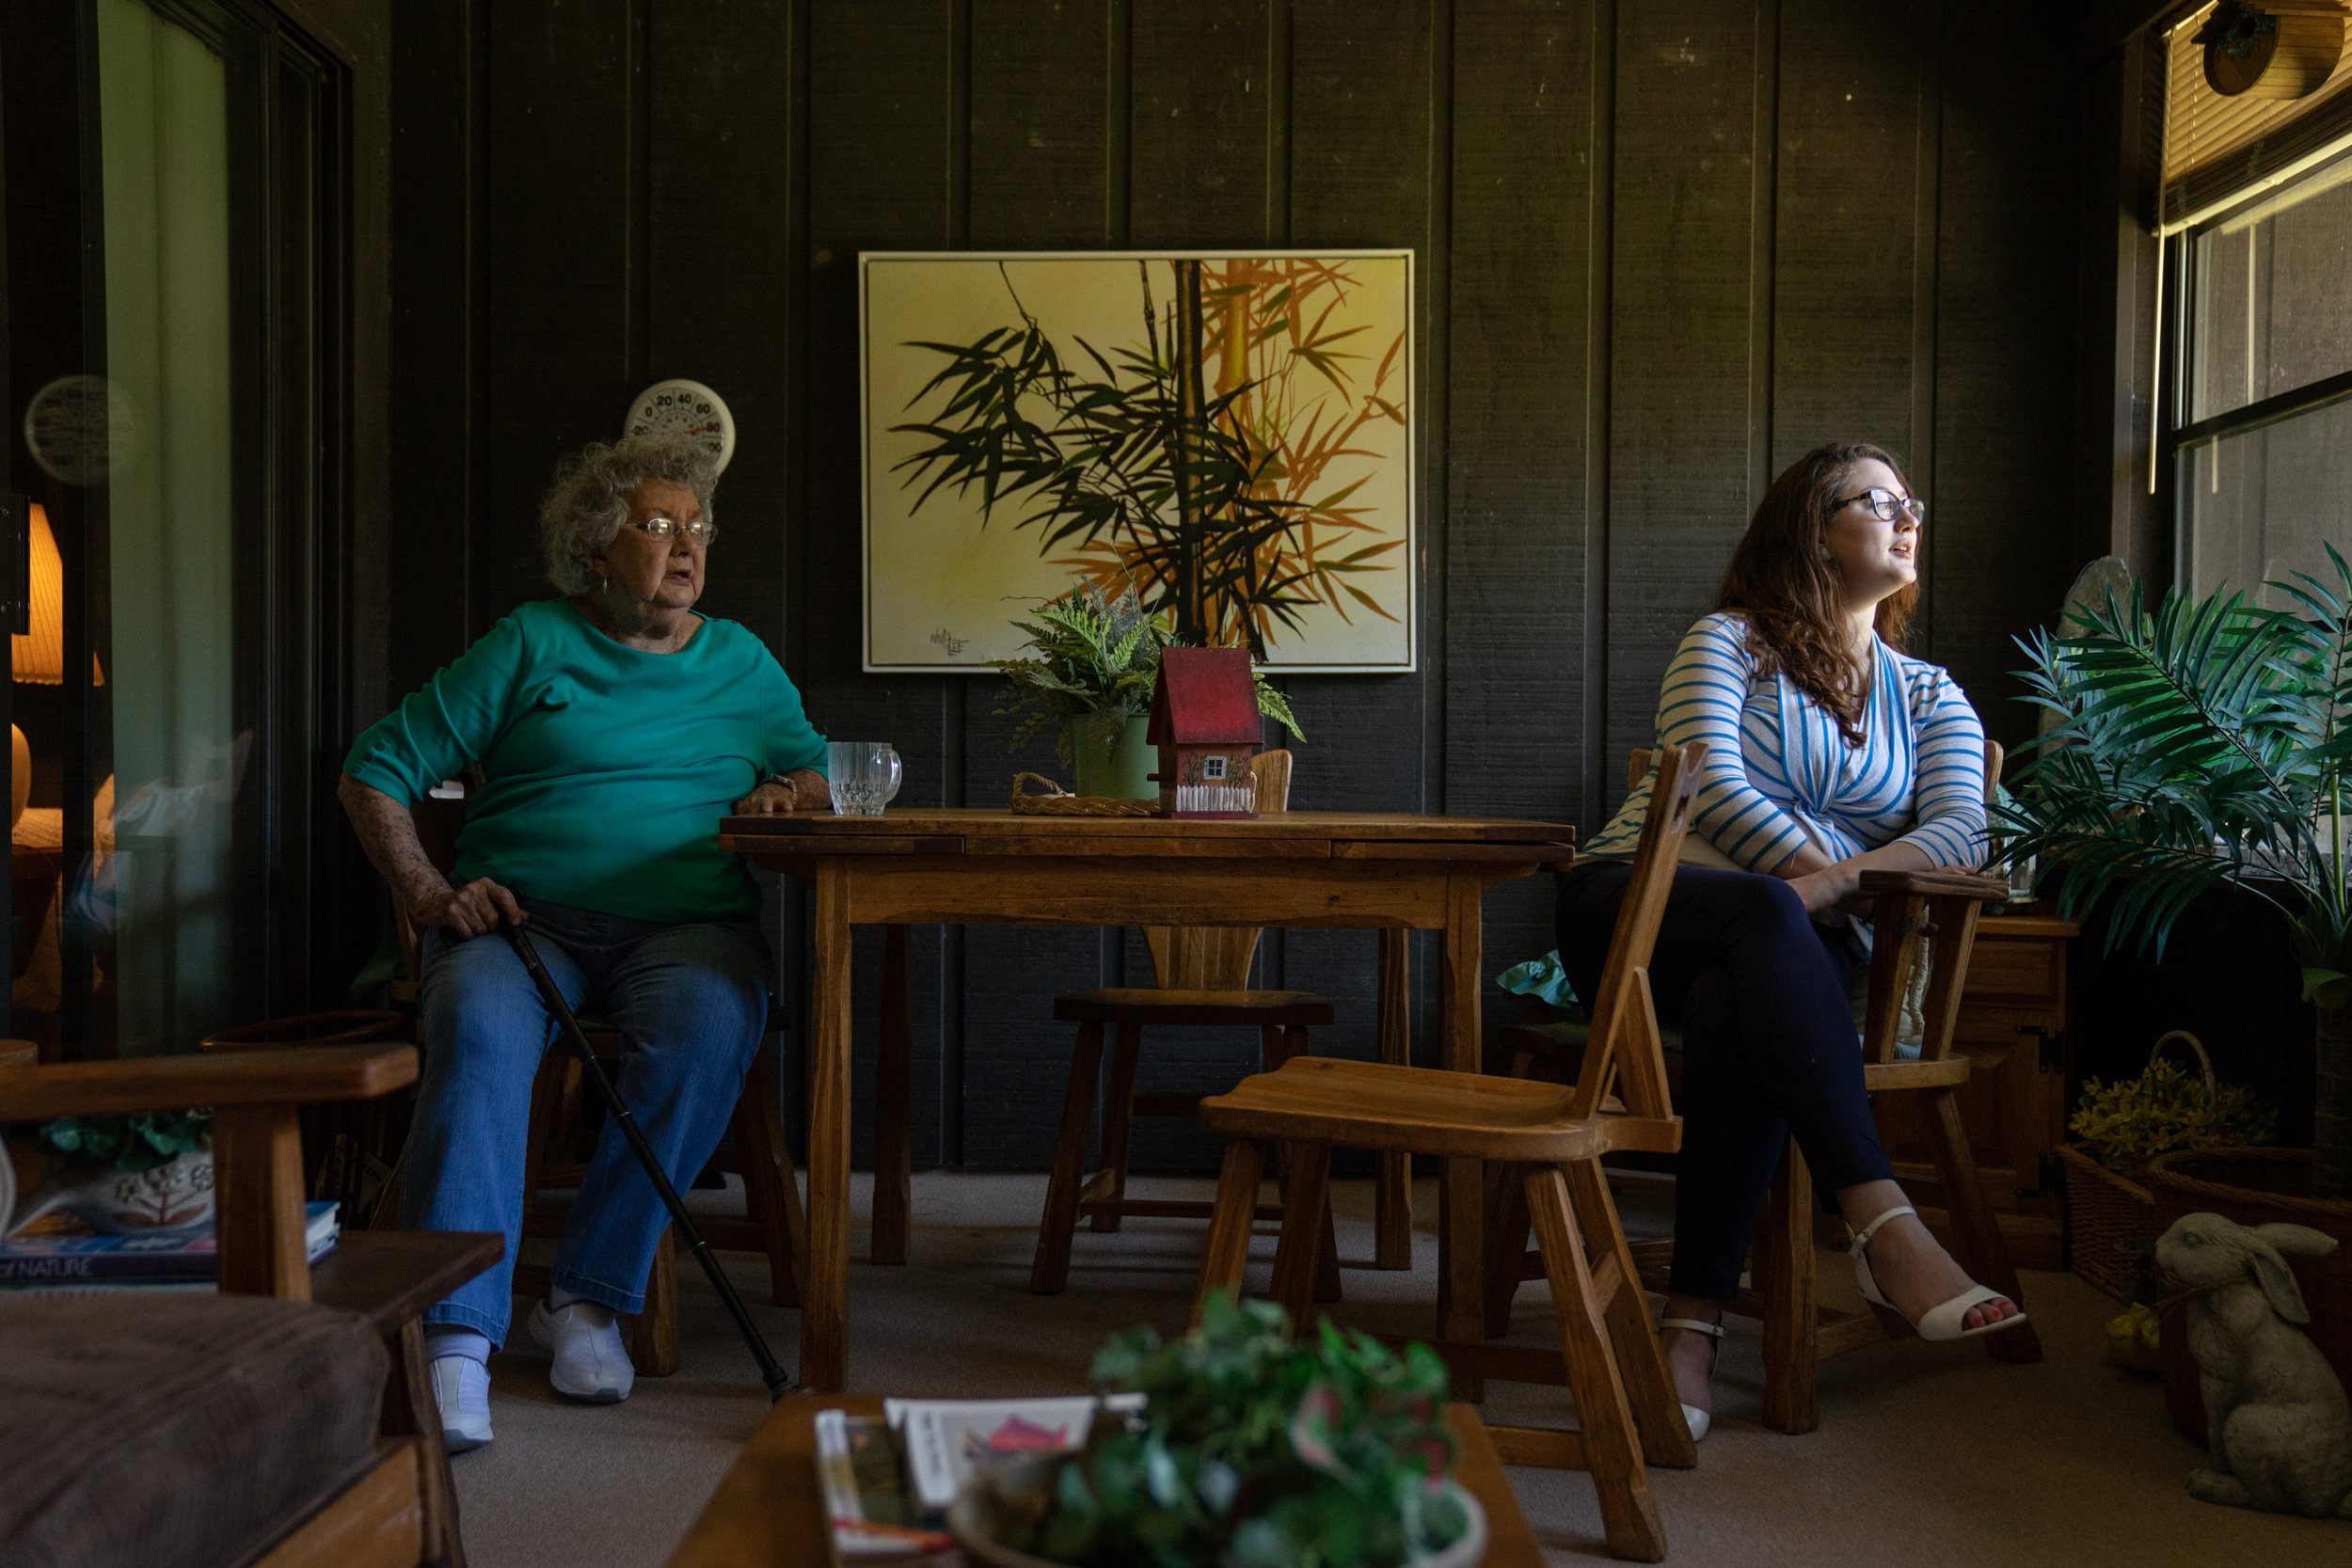 """Mimi"" and Jenna sitting down. Mimi's house."